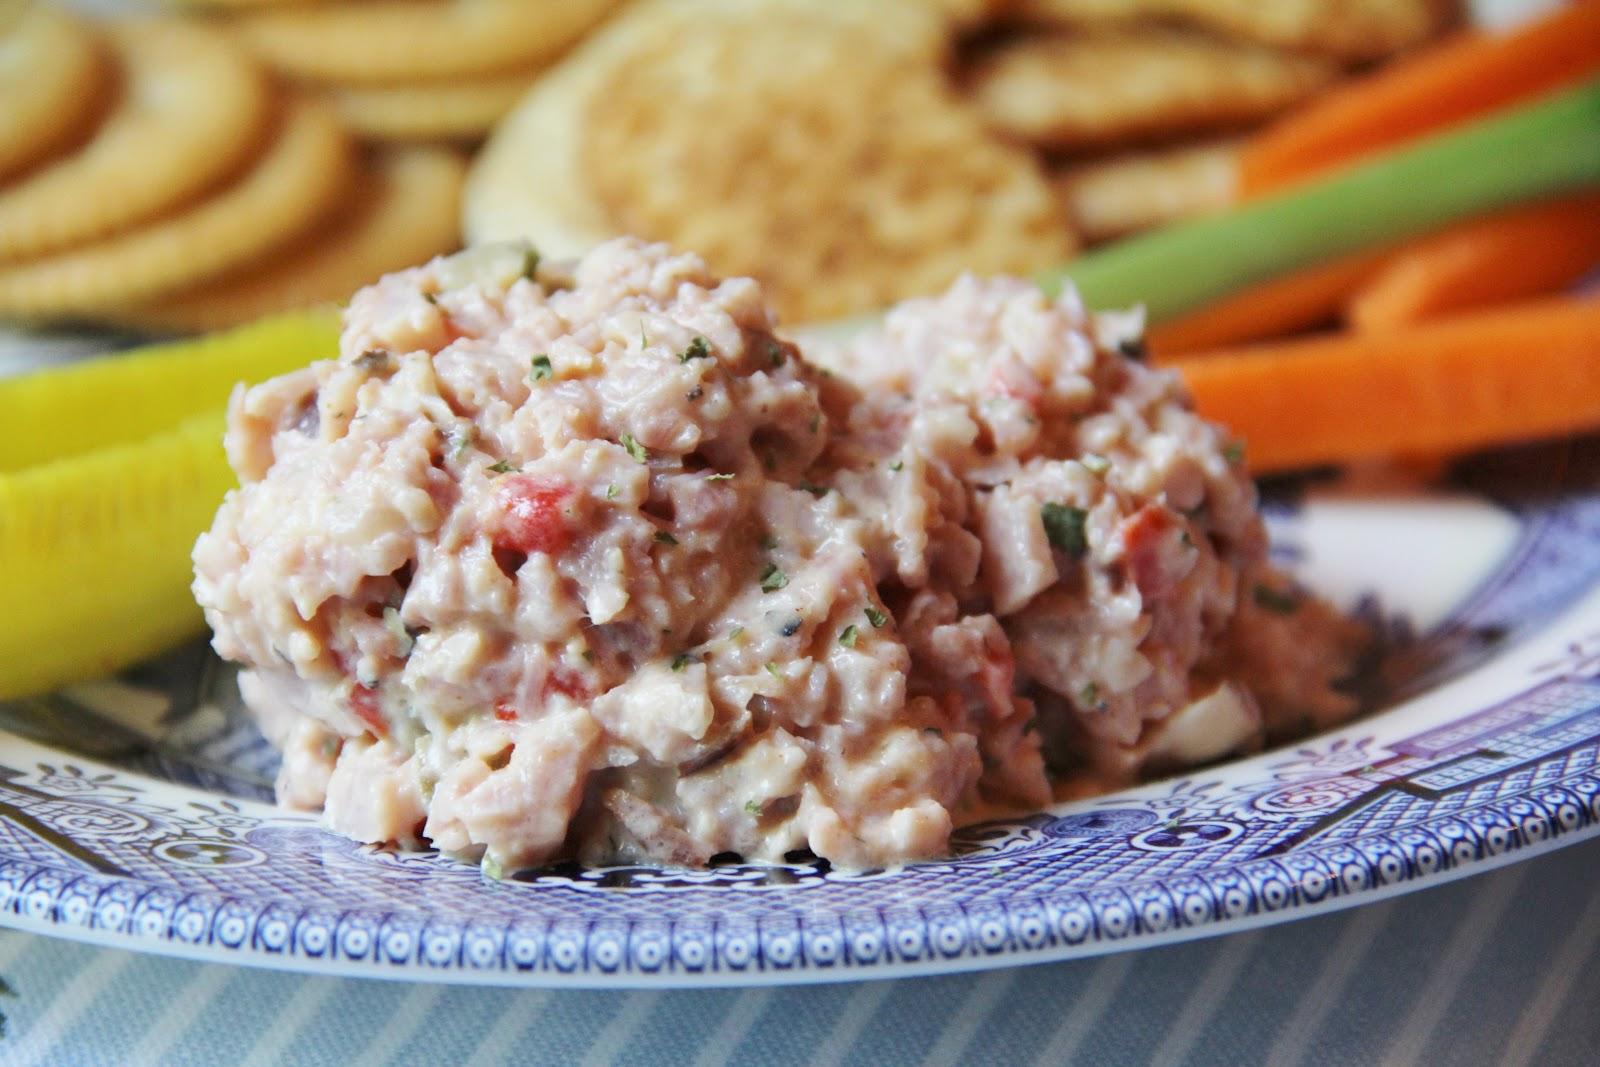 Deep South Dish: Deviled Ham Salad - Bologna Salad